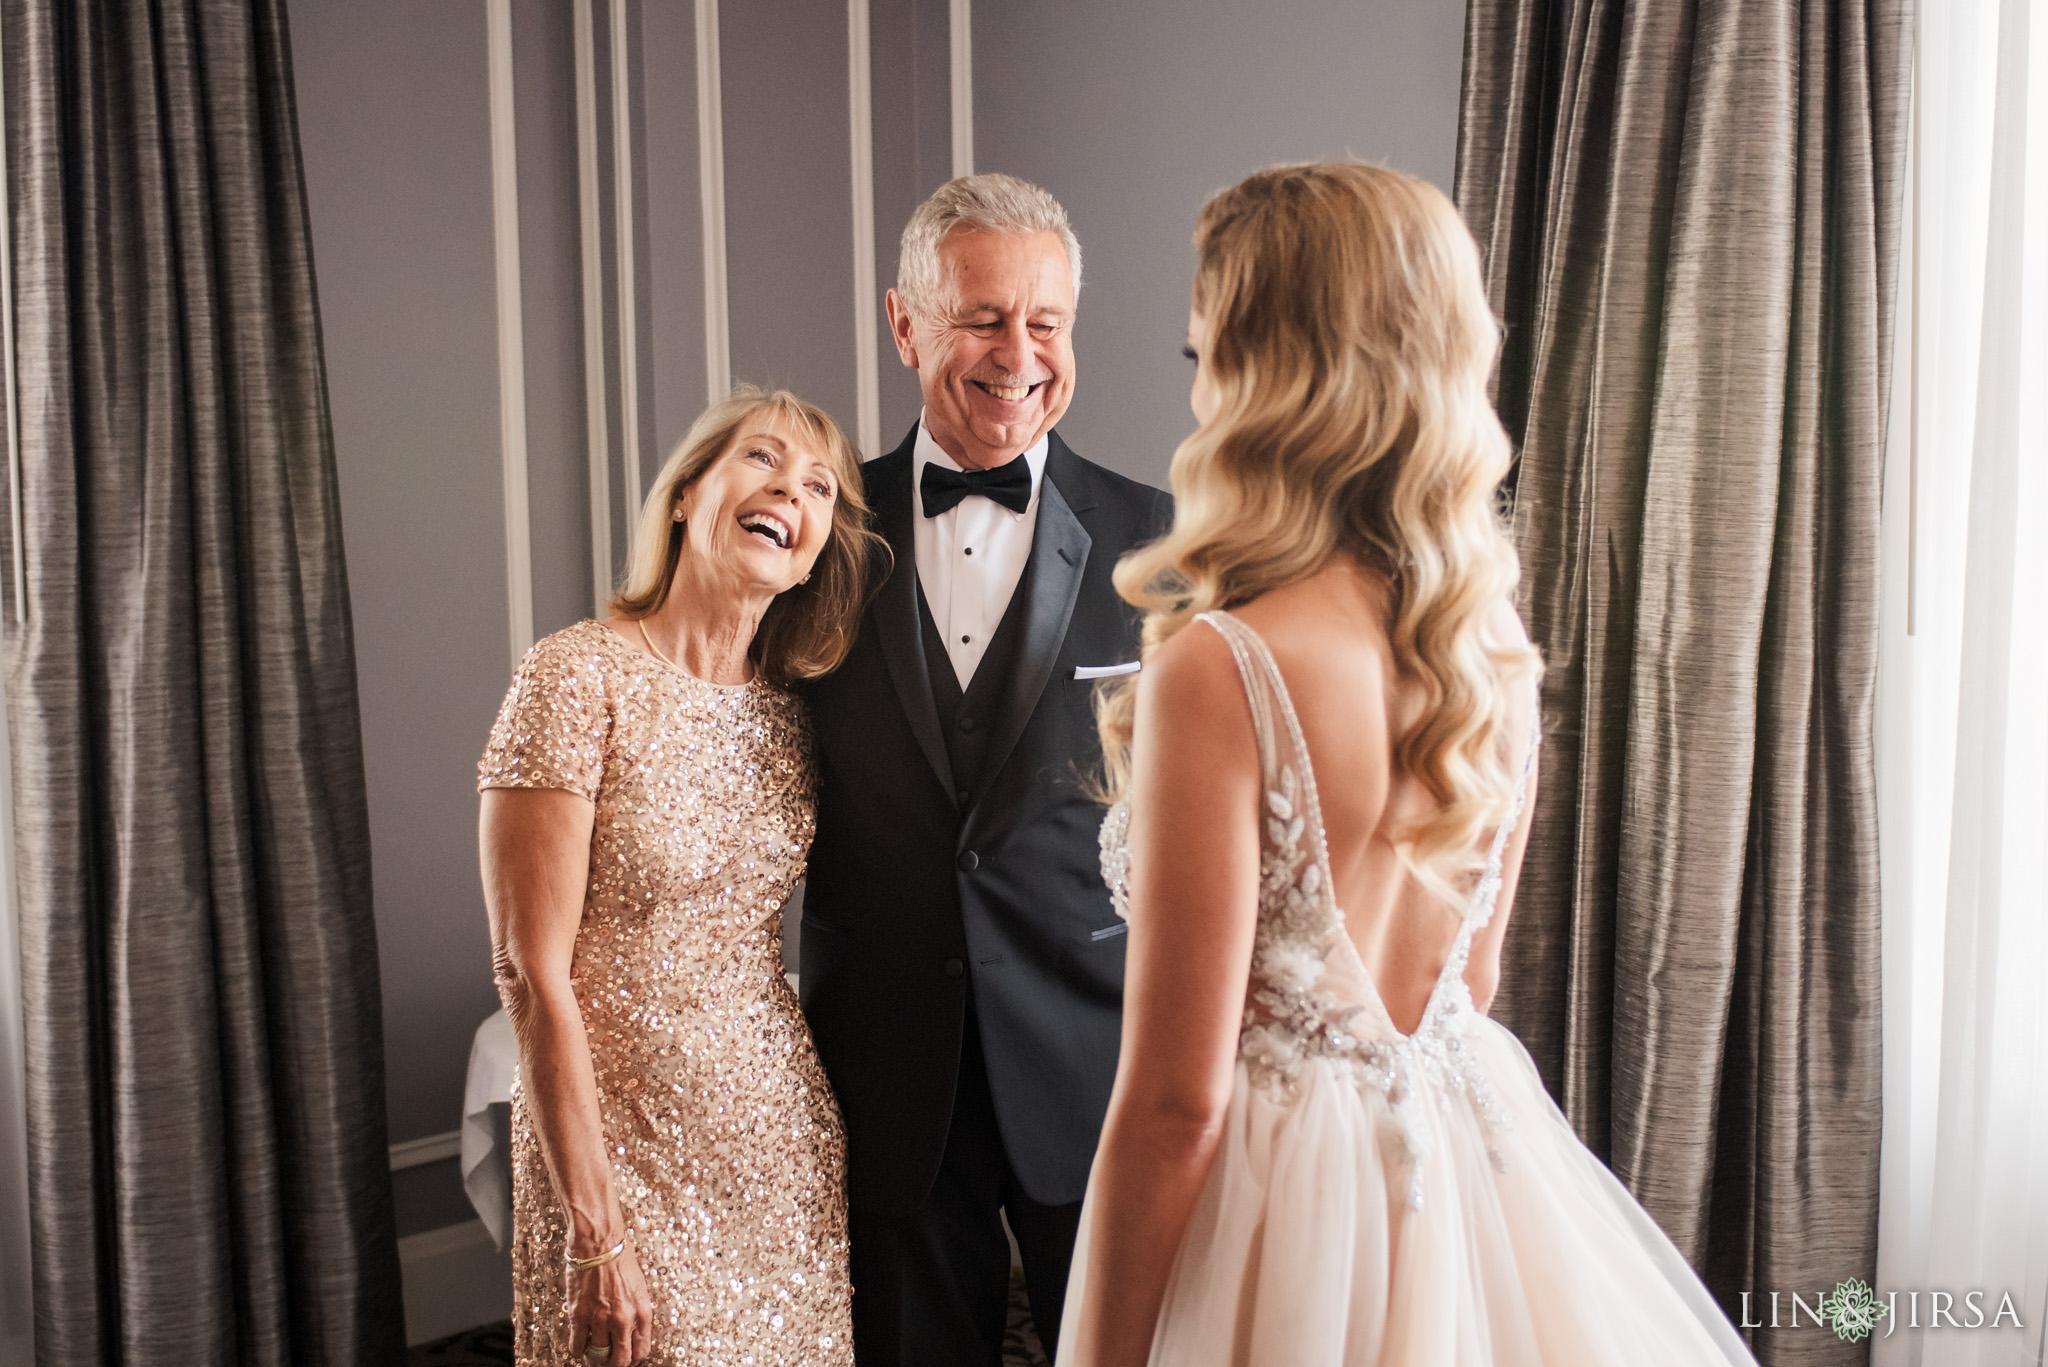 004 millennium biltmore hotel los angeles wedding photography